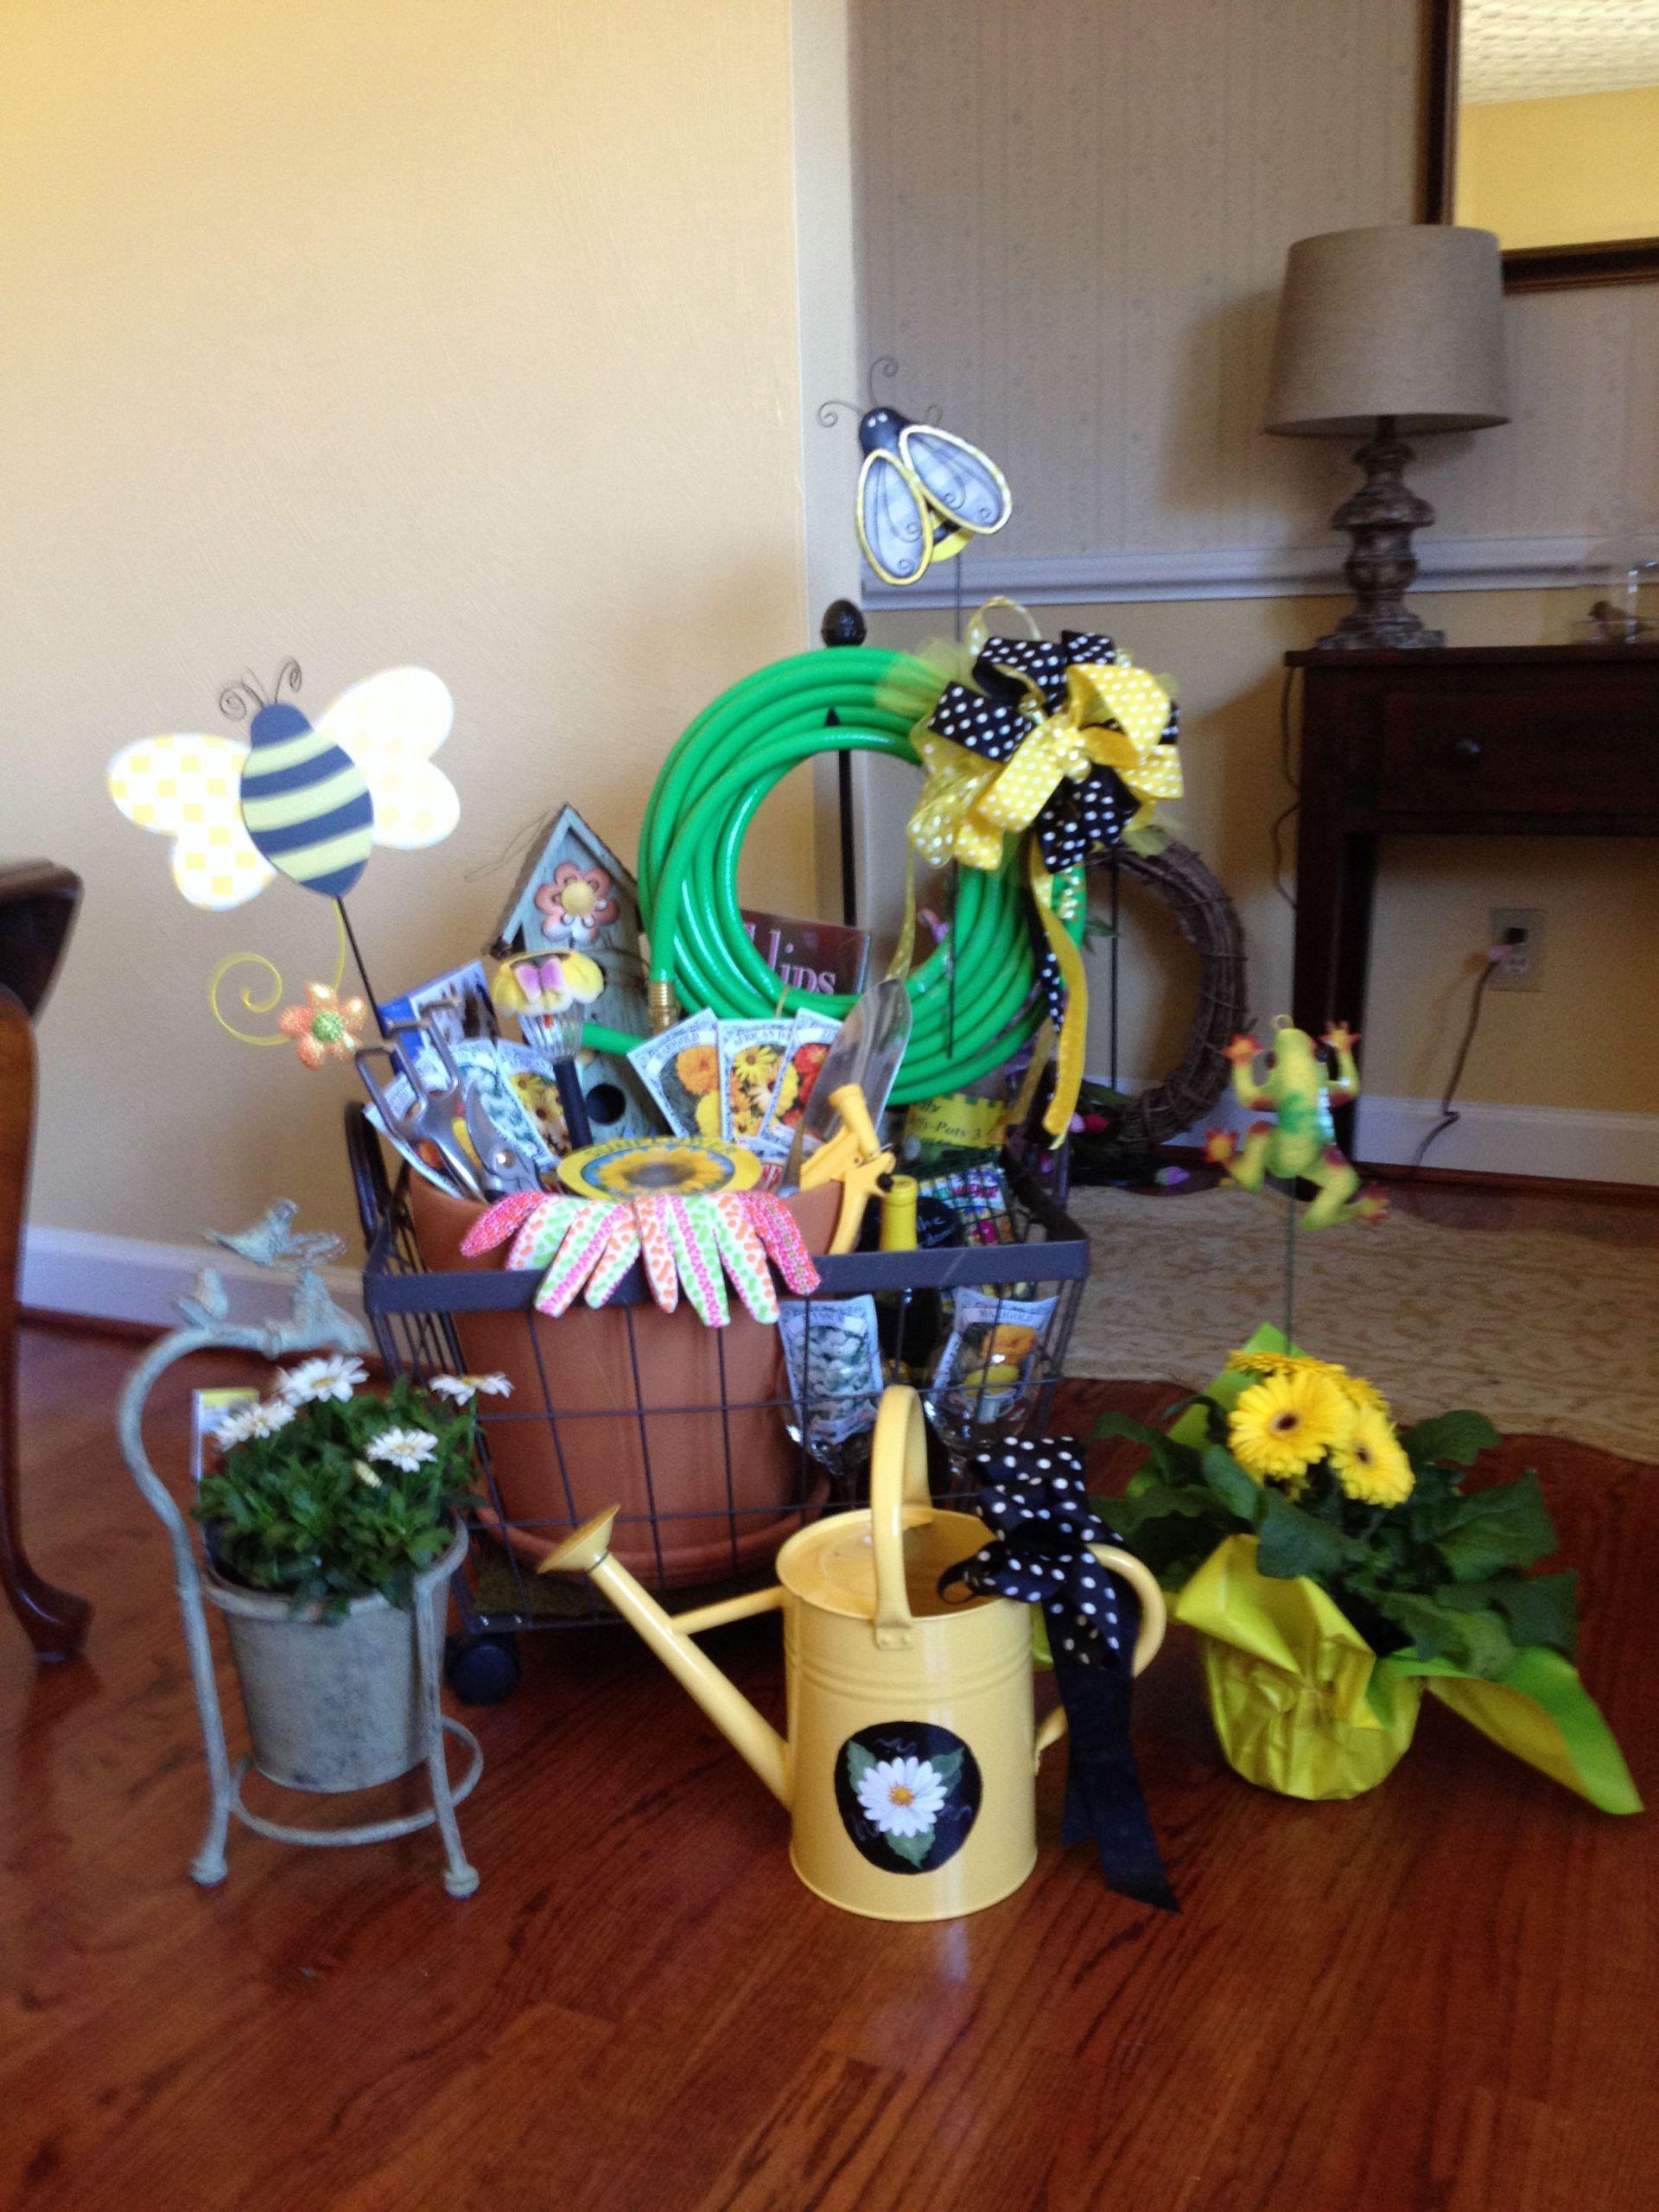 Garden Themed Gift Basket Ideas  Garden raffle basket for a fashion shiw